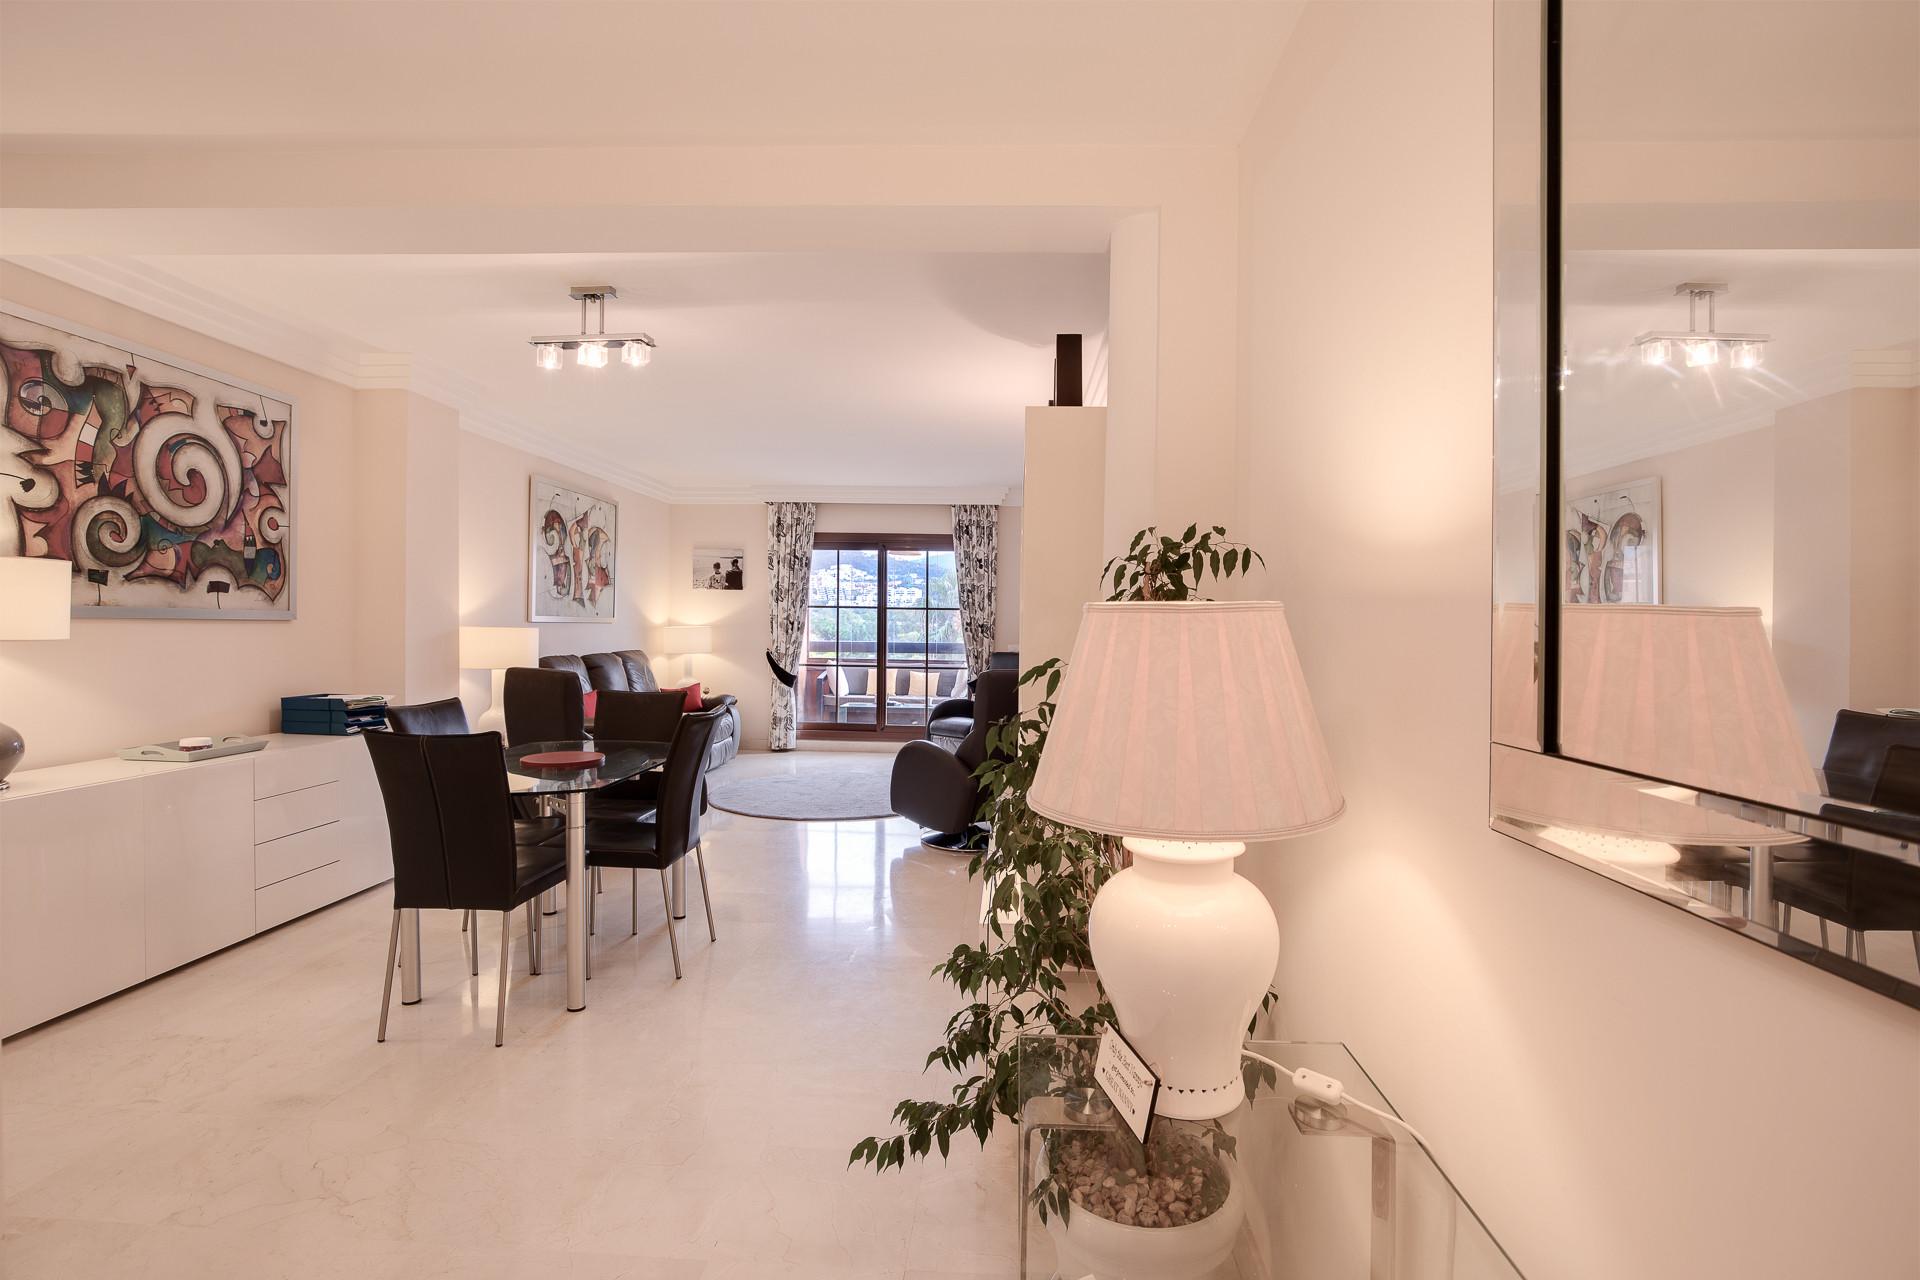 Apartment For Sale in Benahavis (Gazules del Sol)